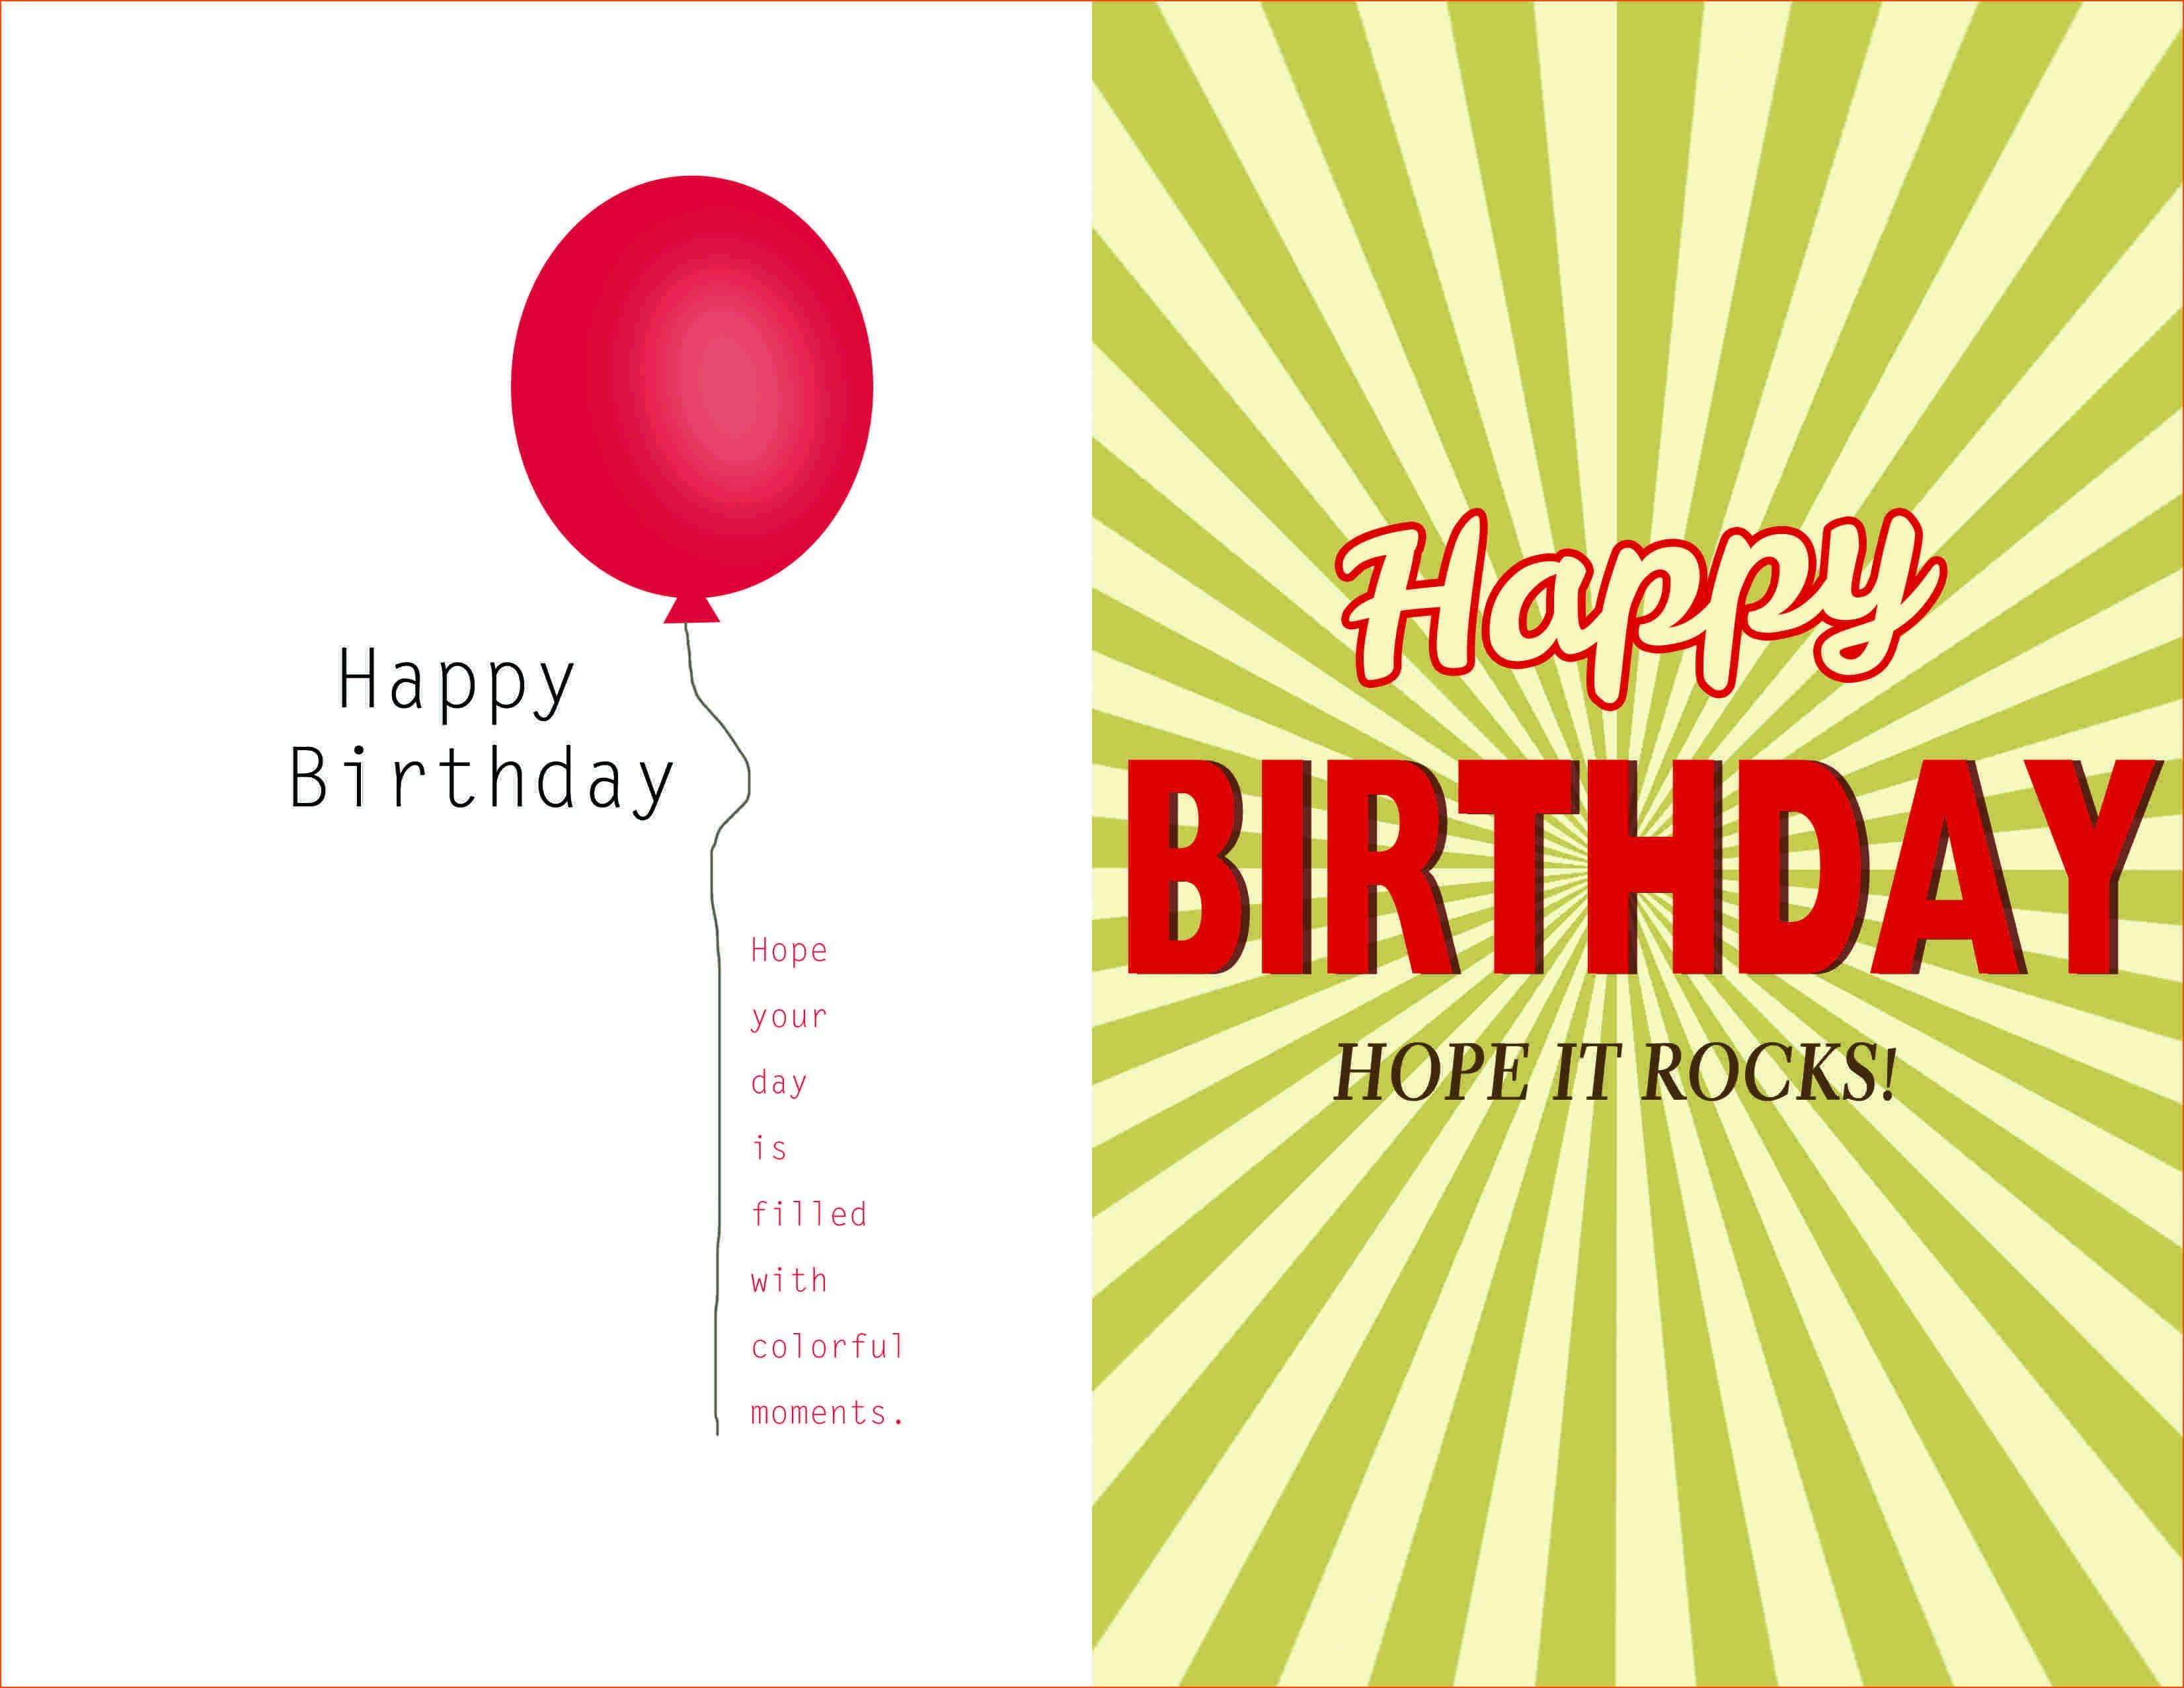 Birthday Card Template Word Document  Blank Microsoft Text Within Microsoft Word Birthday Card Template